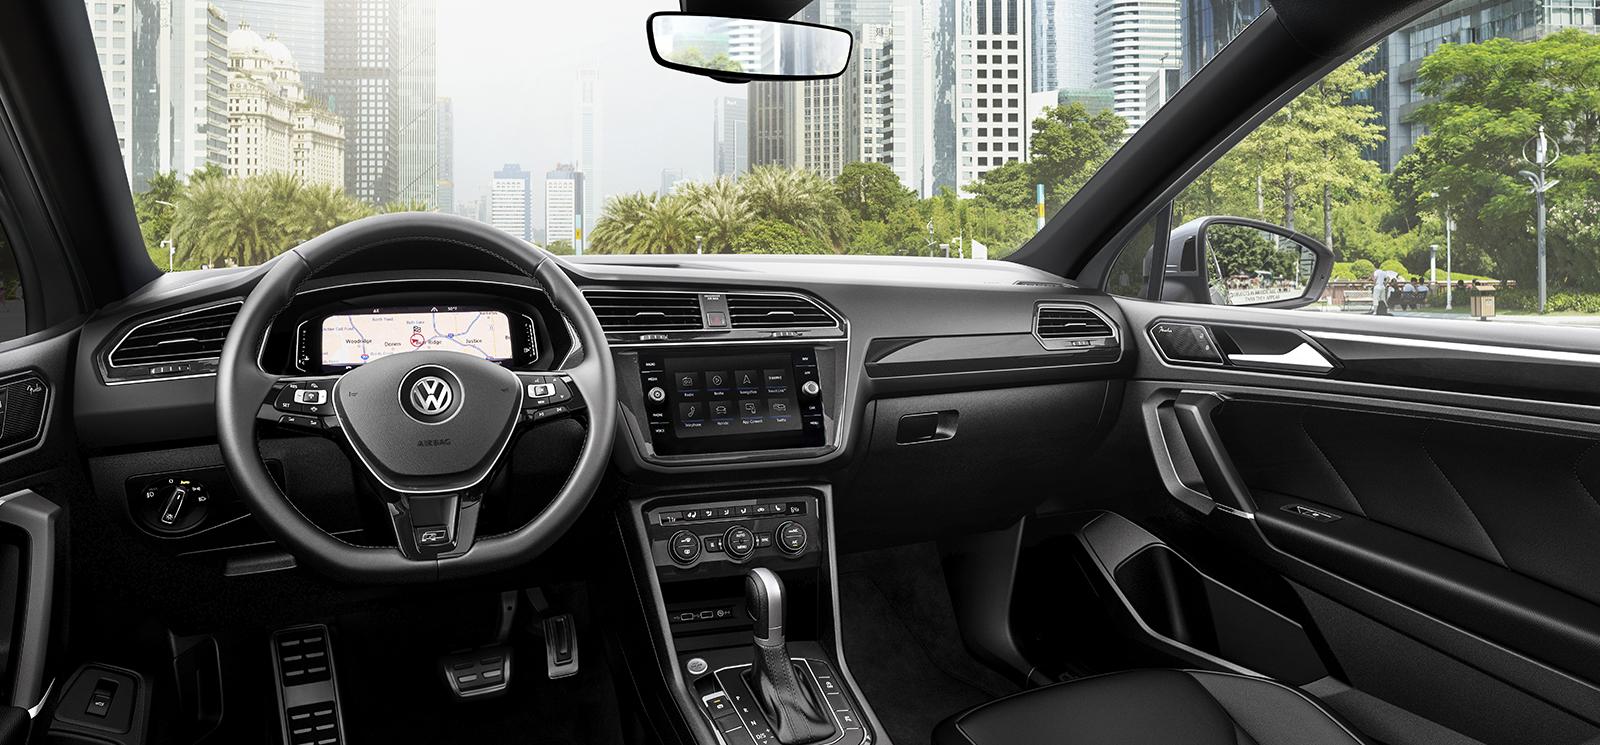 2021 Volkswagen Tiguan Lease near Washington, DC